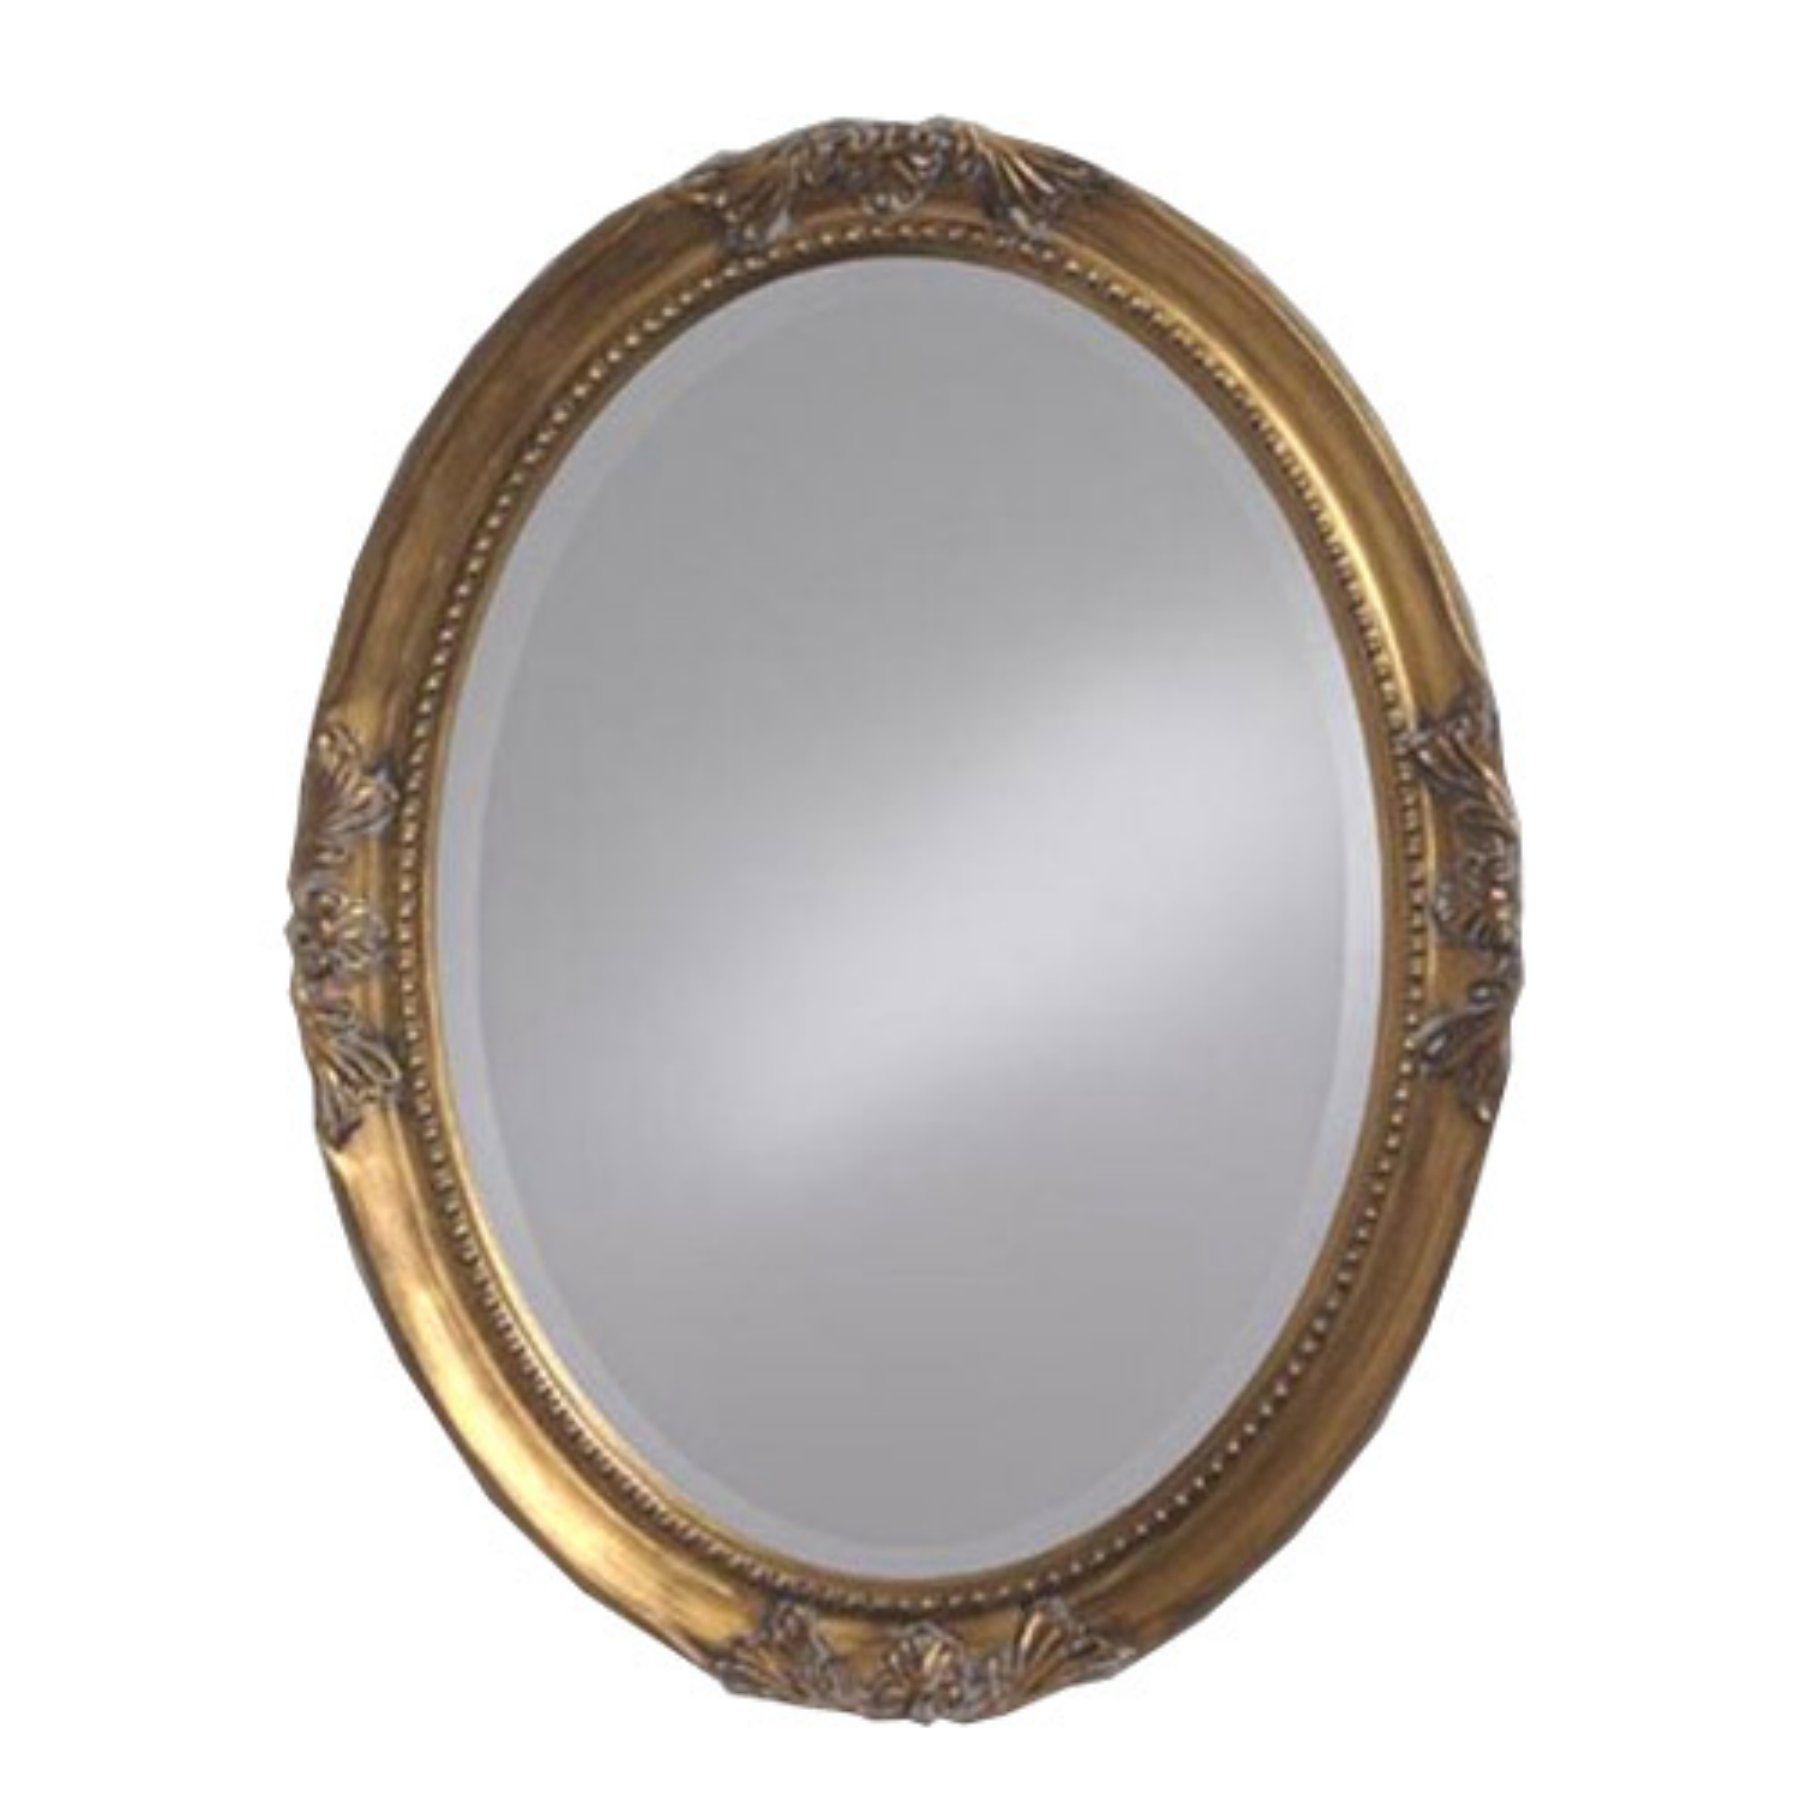 Elizabeth Austin Queen Anne Oval Vanity Mirror 25W x 33H in. - 4015 ...